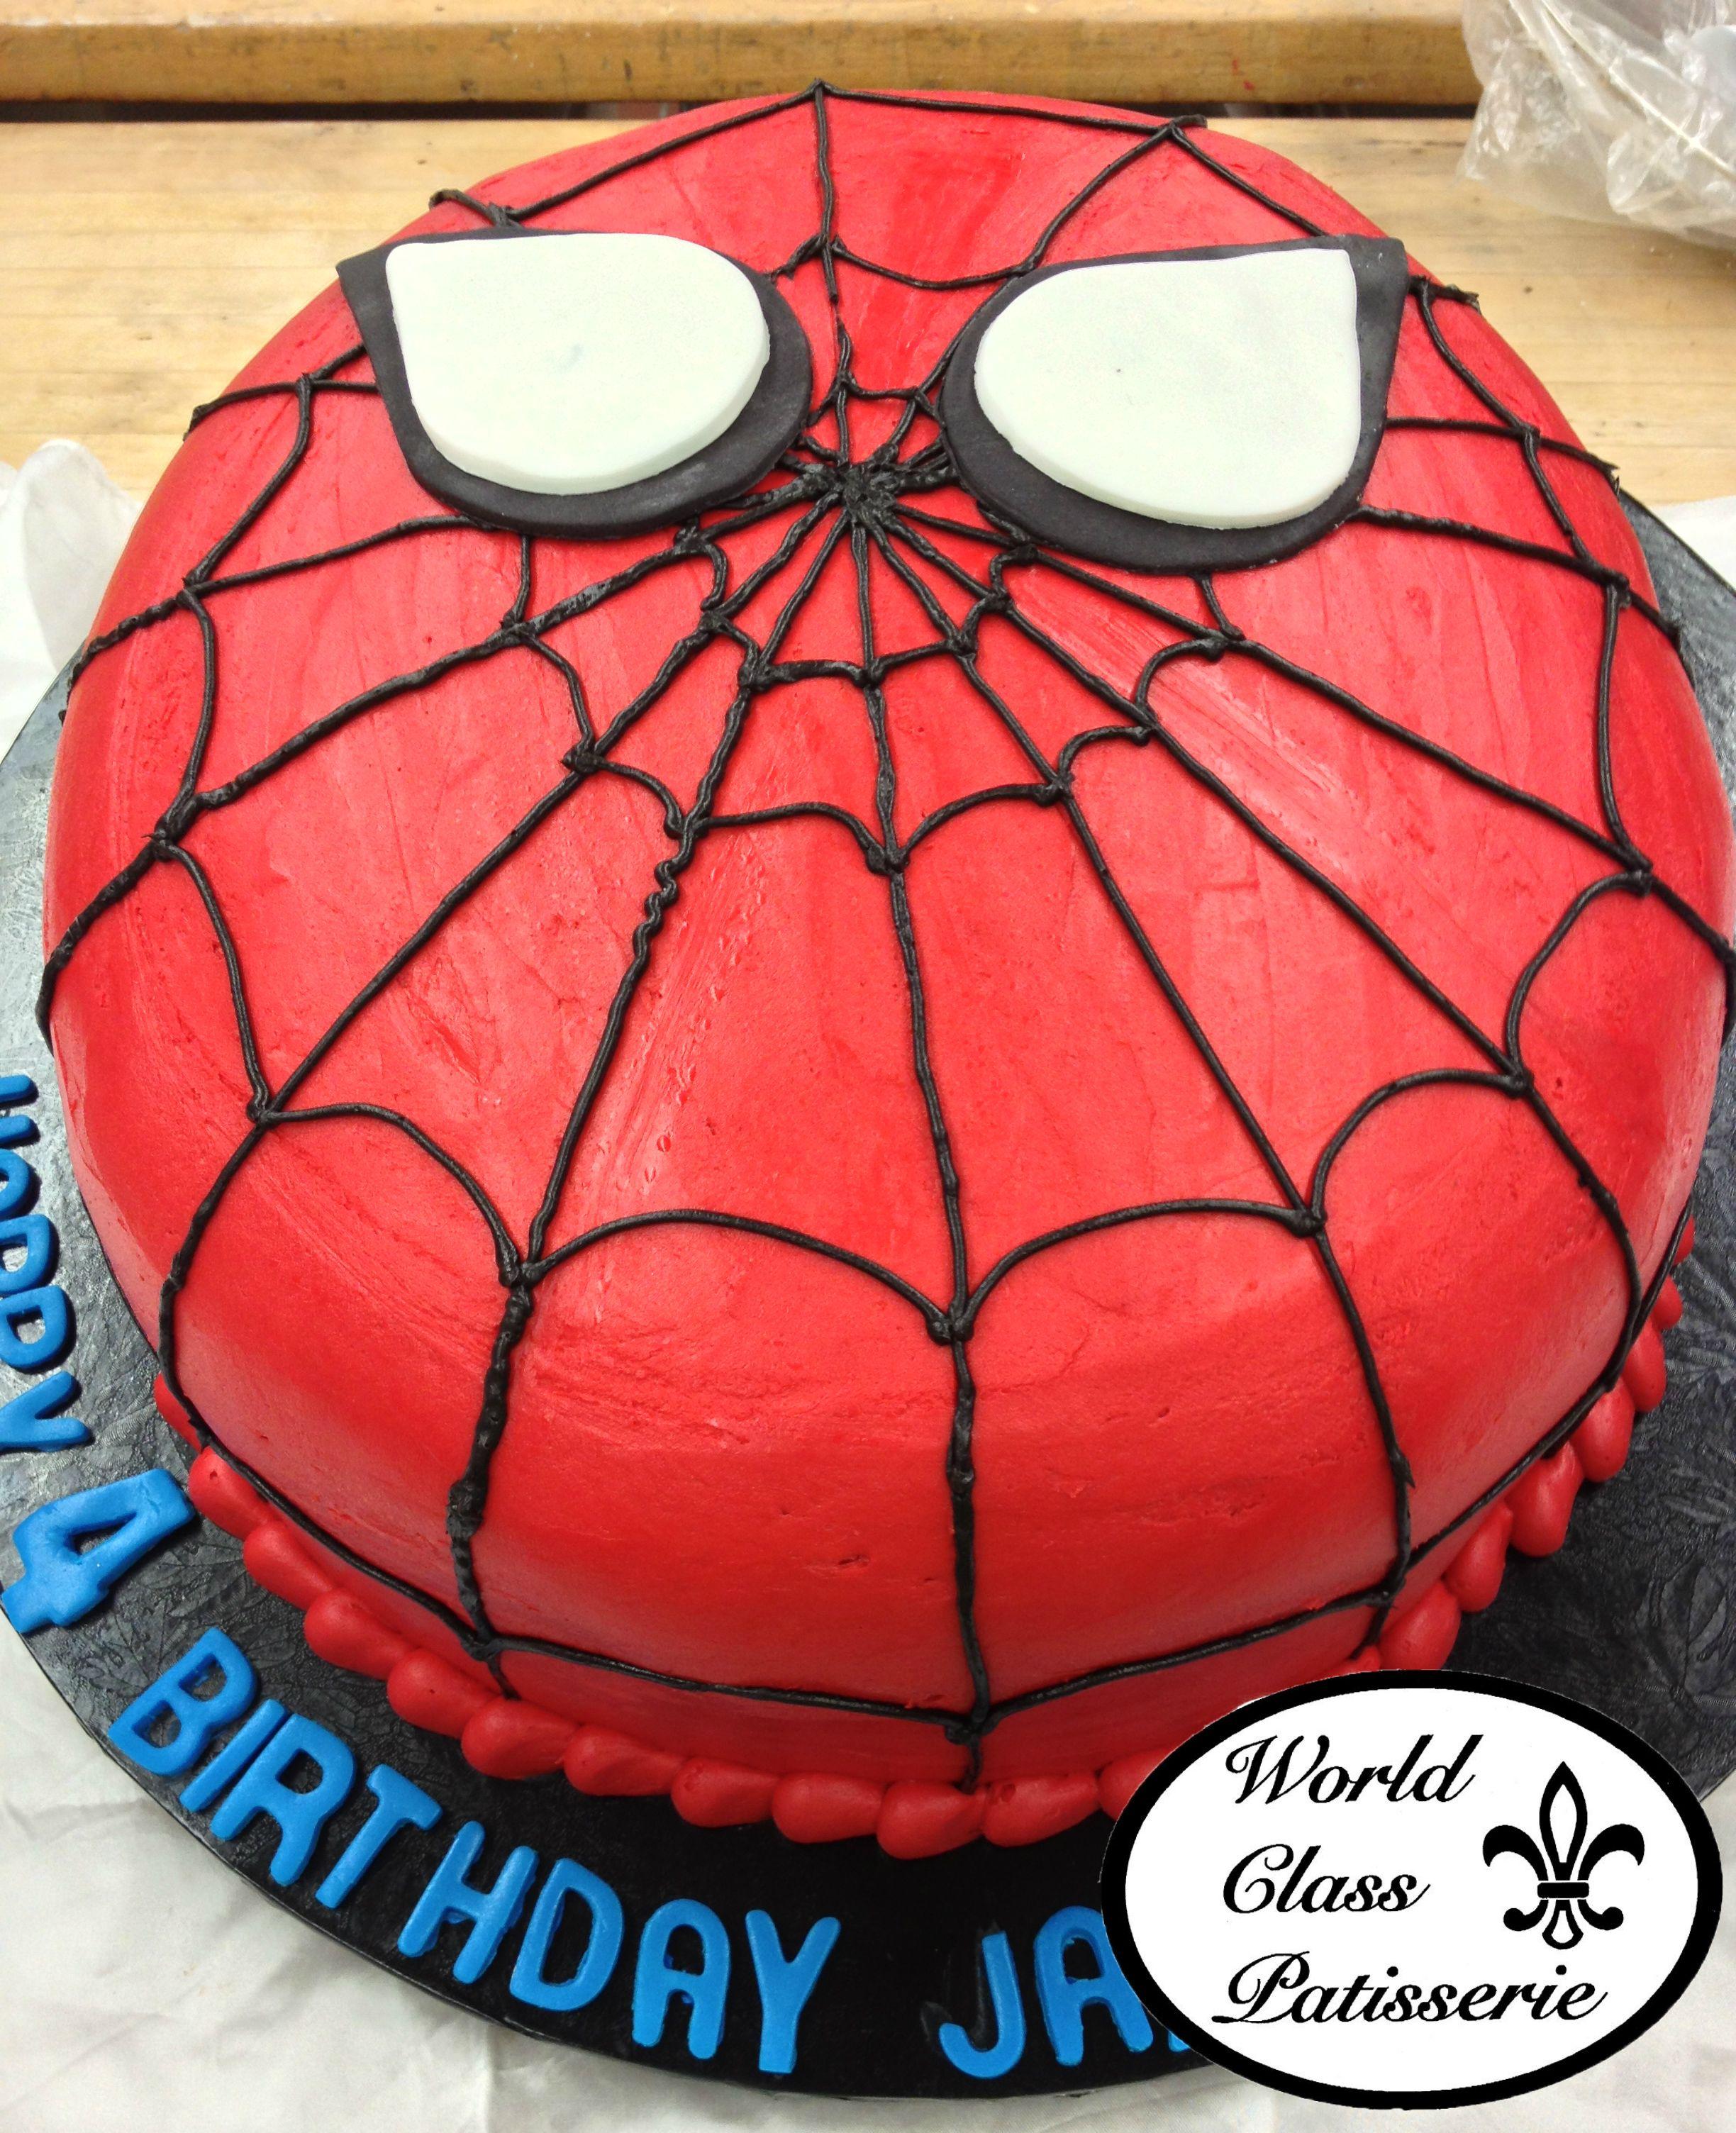 Astonishing Happy Birthday Jaxon This World Class Patisserie Cake Is Funny Birthday Cards Online Elaedamsfinfo